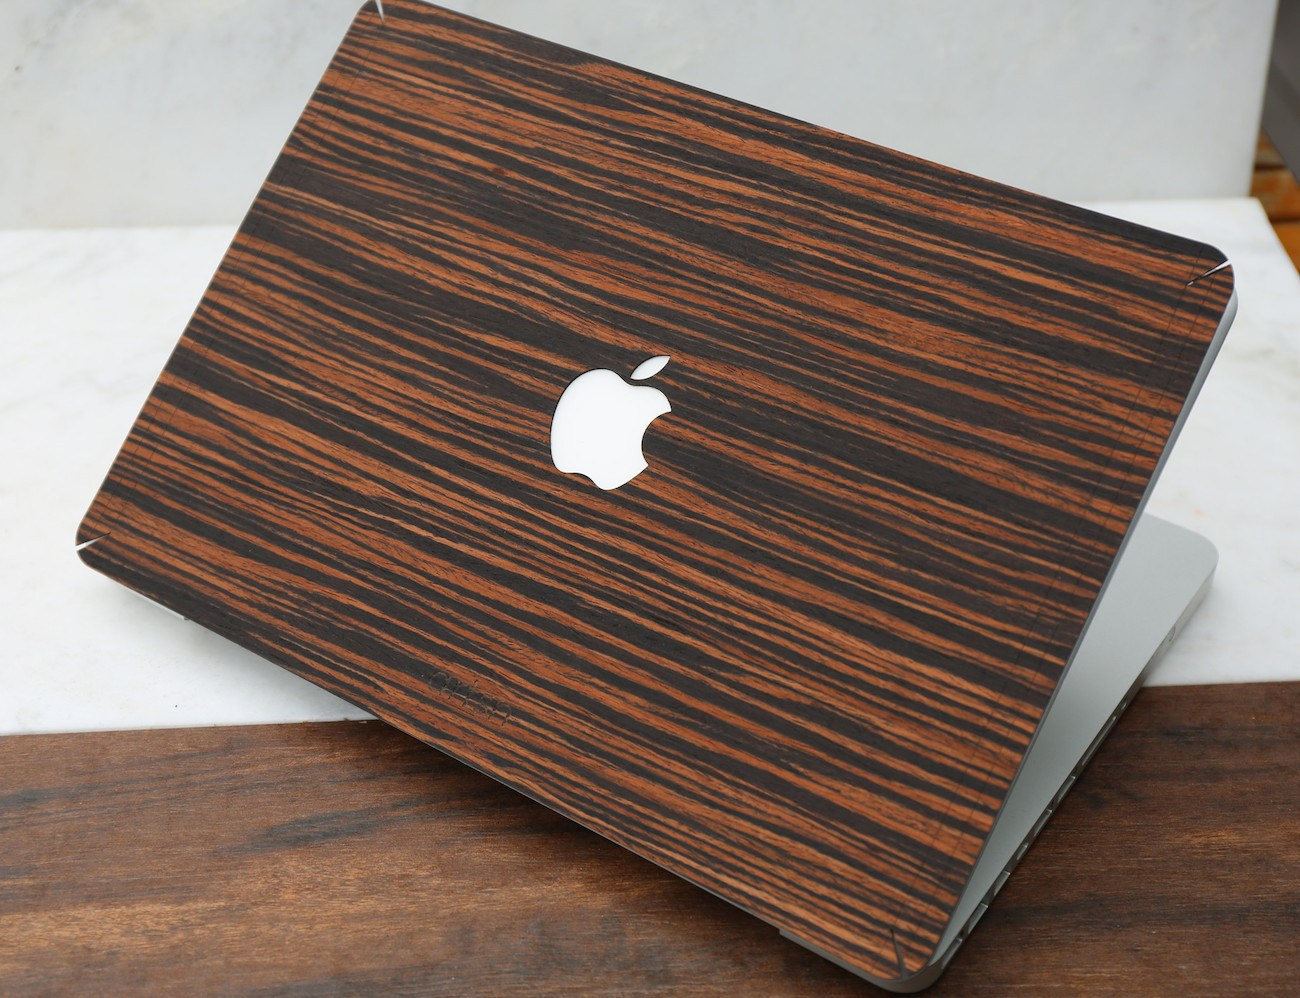 Ebony Wood MacBook Skin